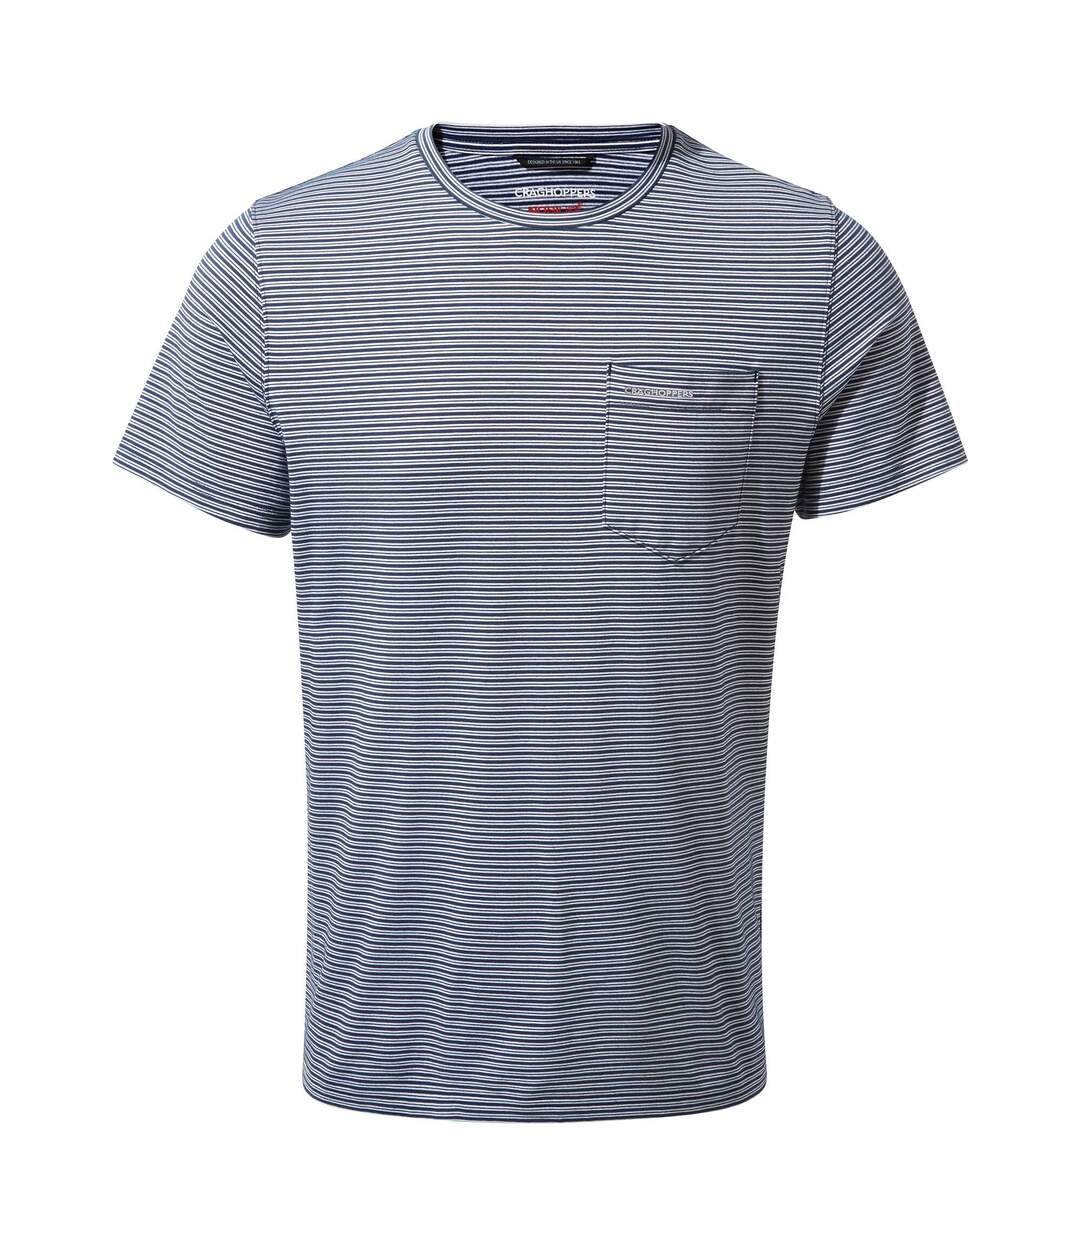 Craghoppers Mens NosiLife Ina Short Sleeved T-Shirt (Blue Navy Stripe) - UTCG1300